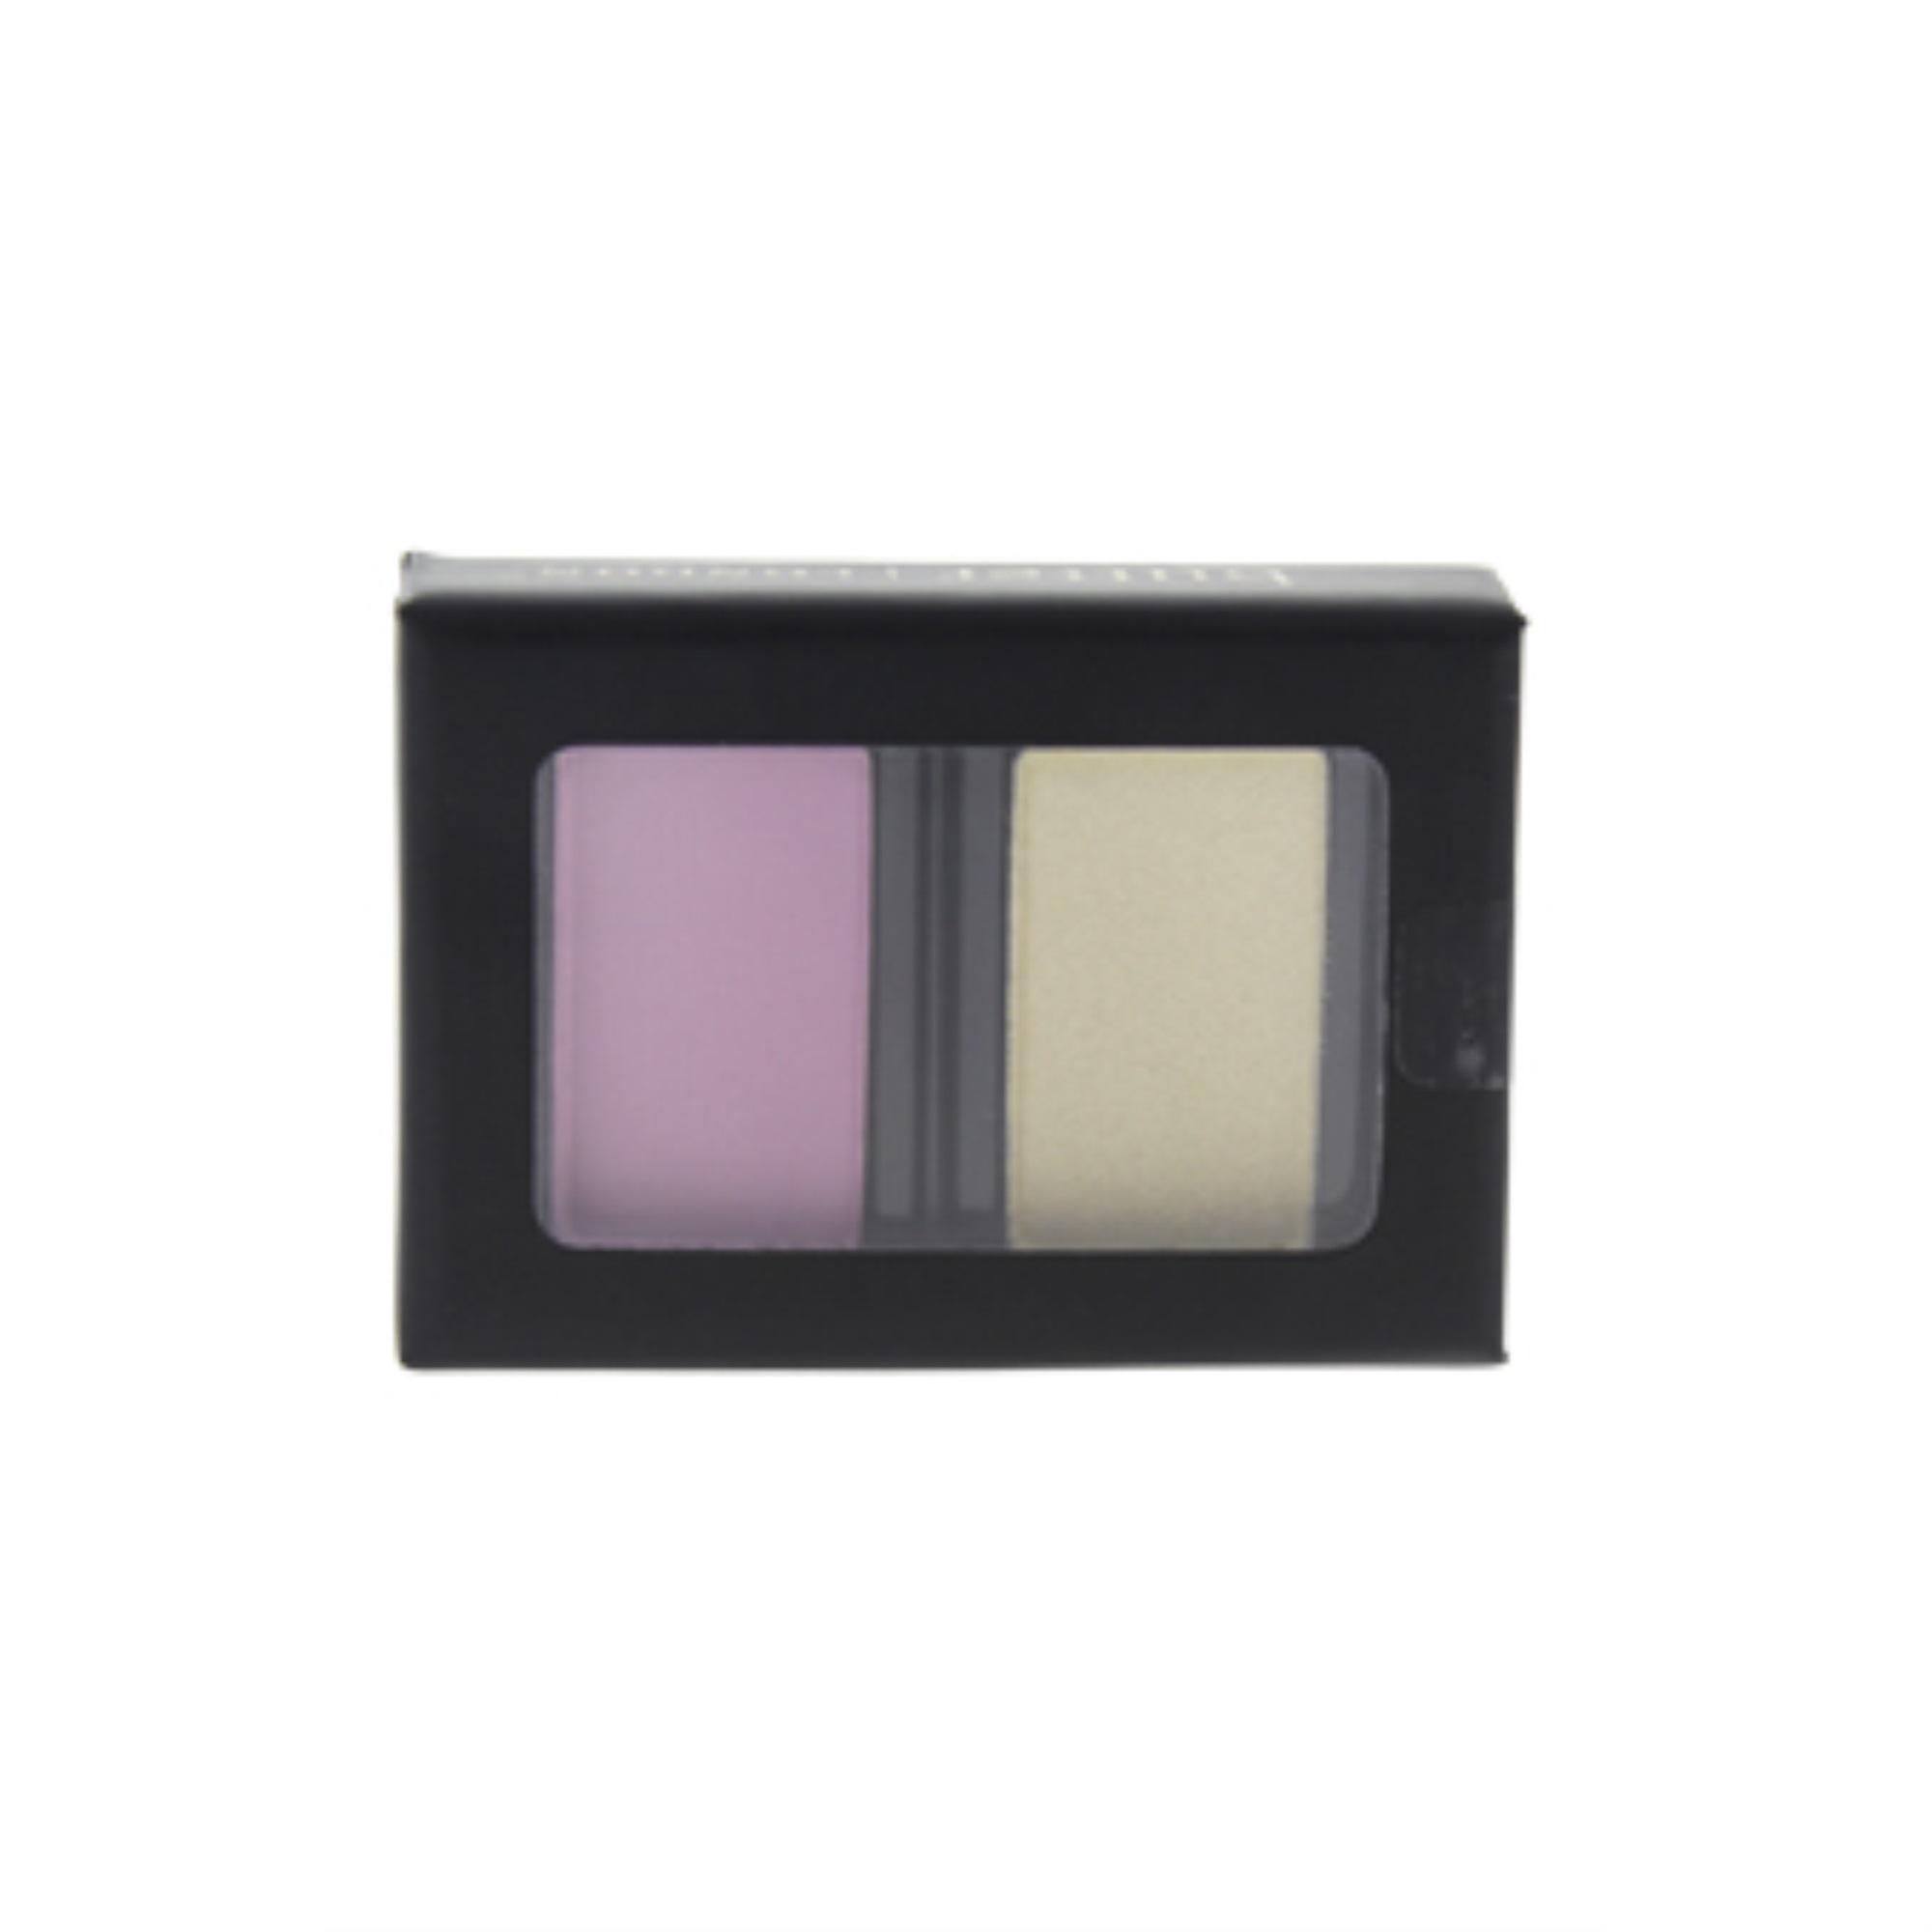 ShadowClutch Wardrobe Duo - Plush Pastels by Butter London for Women - 0.08 oz Eyeshadow - image 1 de 3